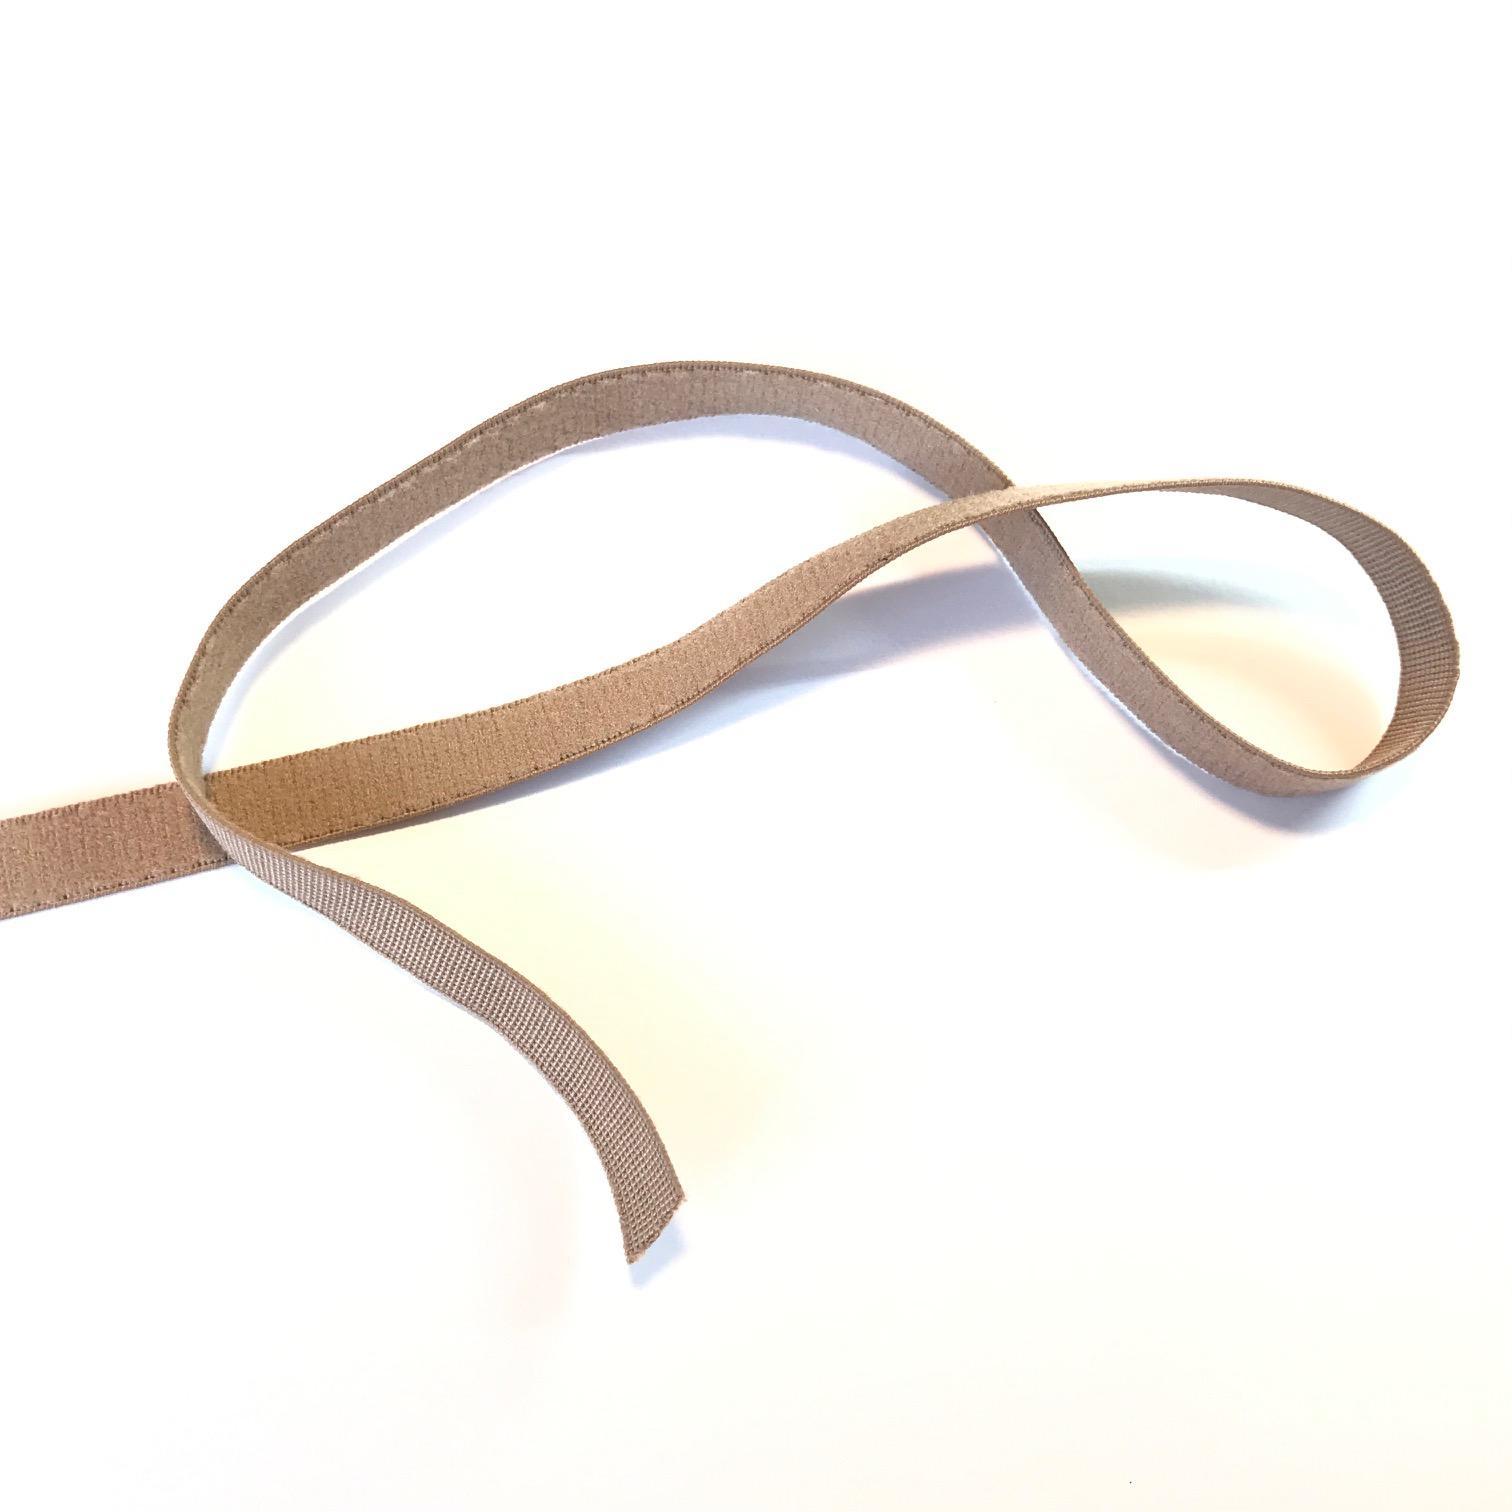 Elastique plat a bretelles 12mm chair